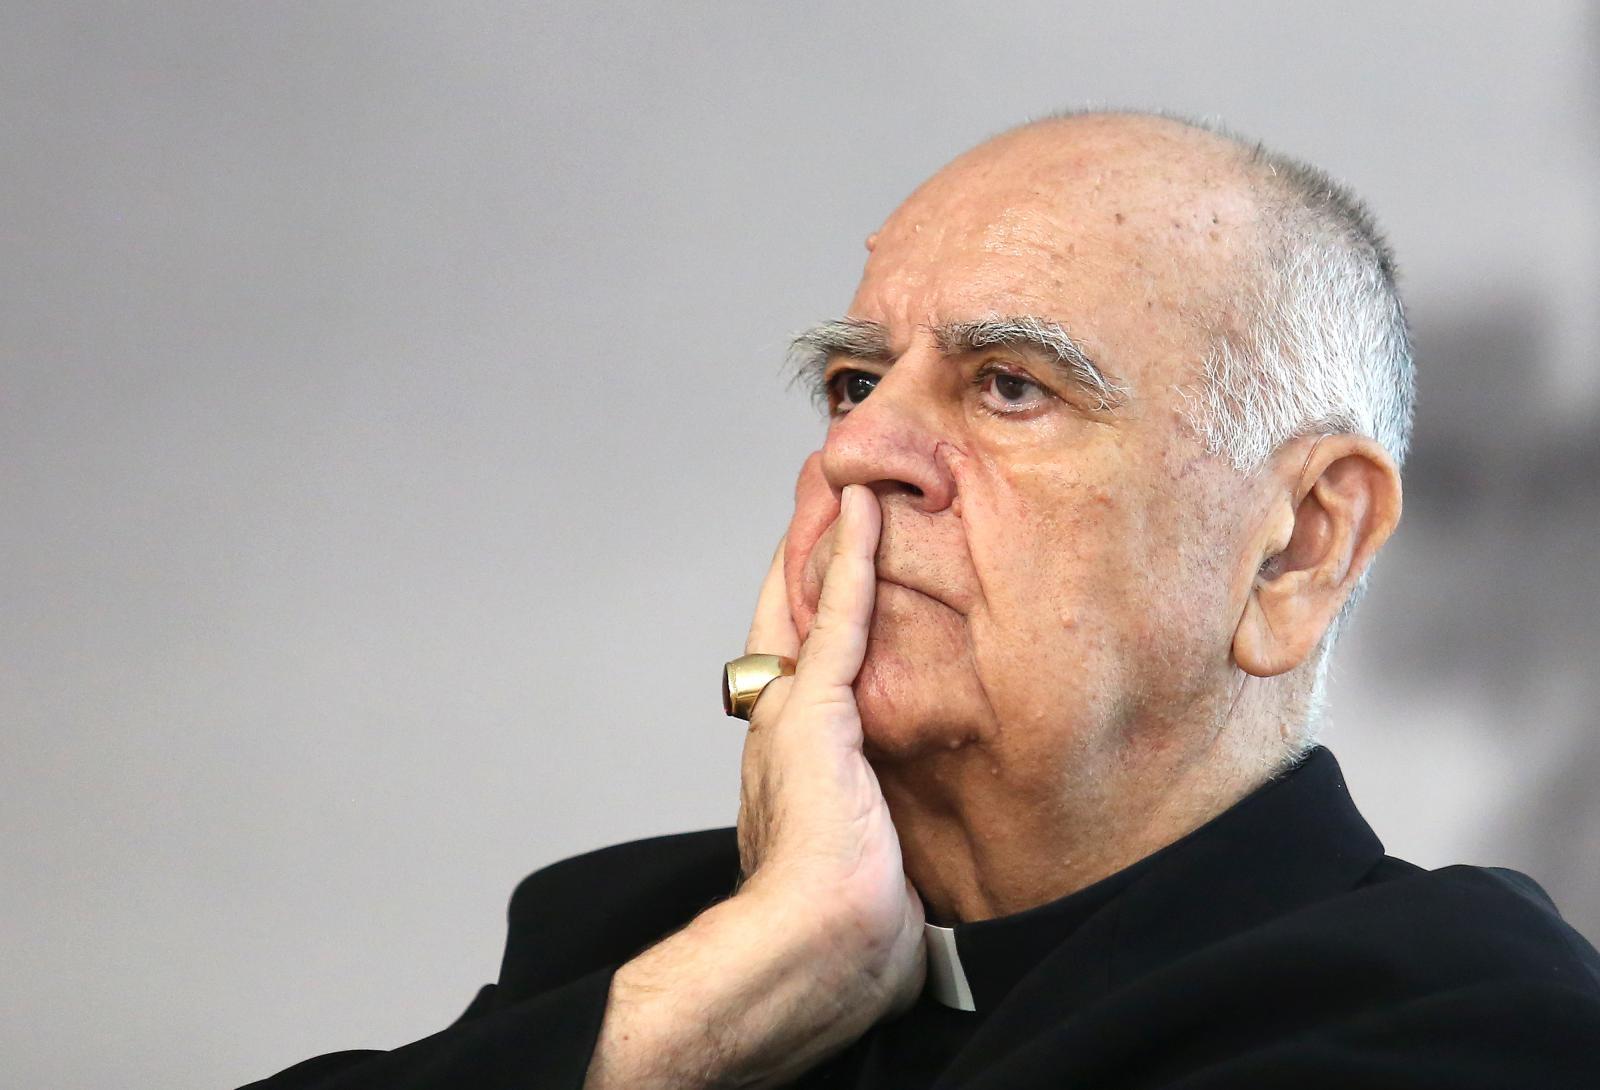 Razgovor s biskupom Perićem: Duboko sam zahvalan Bogu - IKA